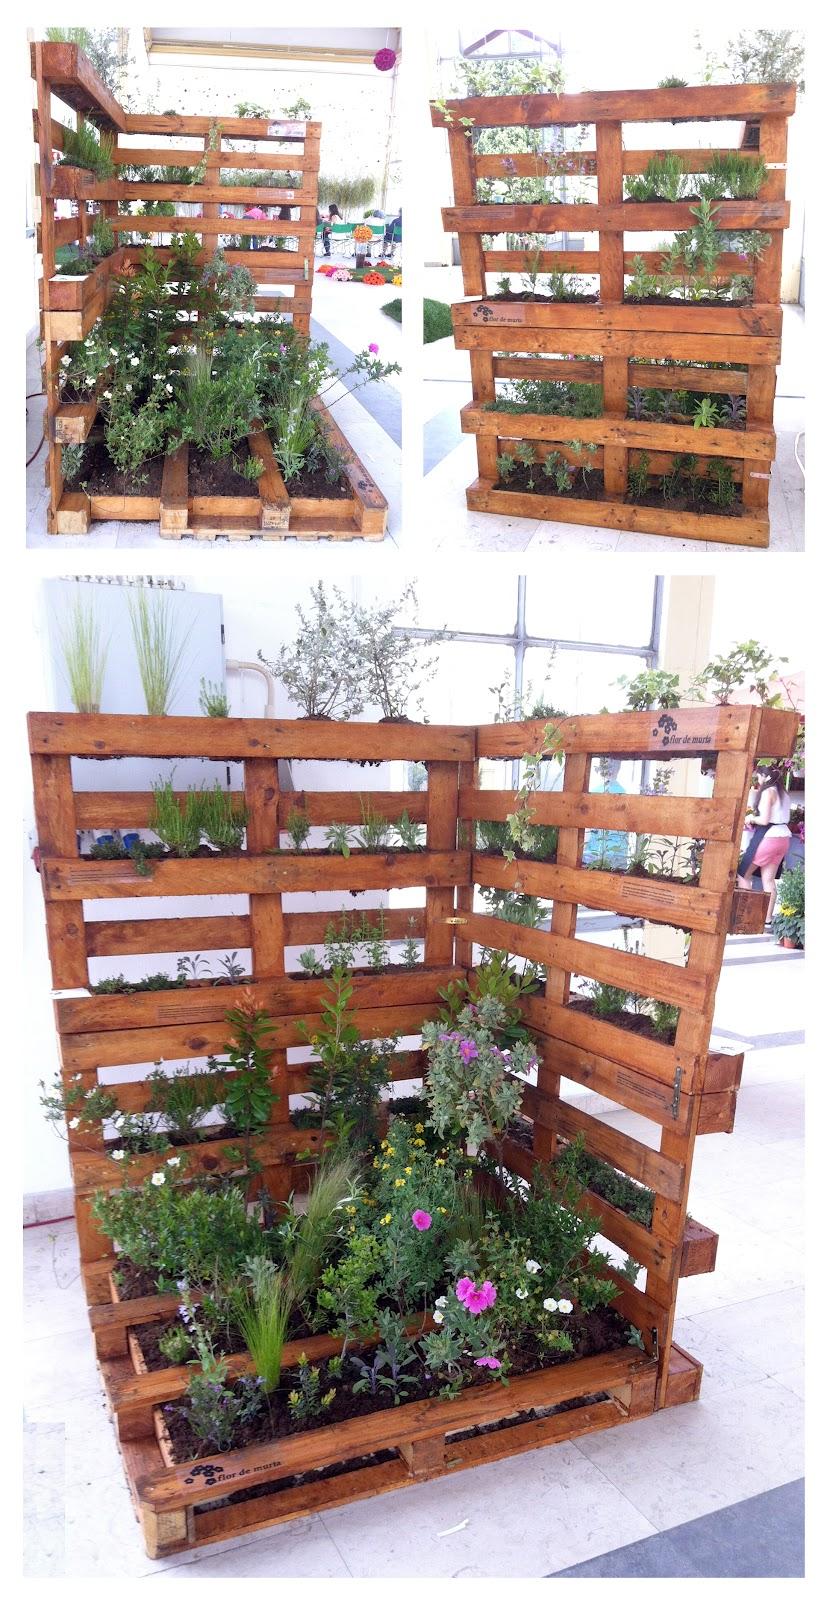 decoracao jardim paletes : decoracao jardim paletes:Lydia-a-dia: Decoração: Paletes no Jardim *-*